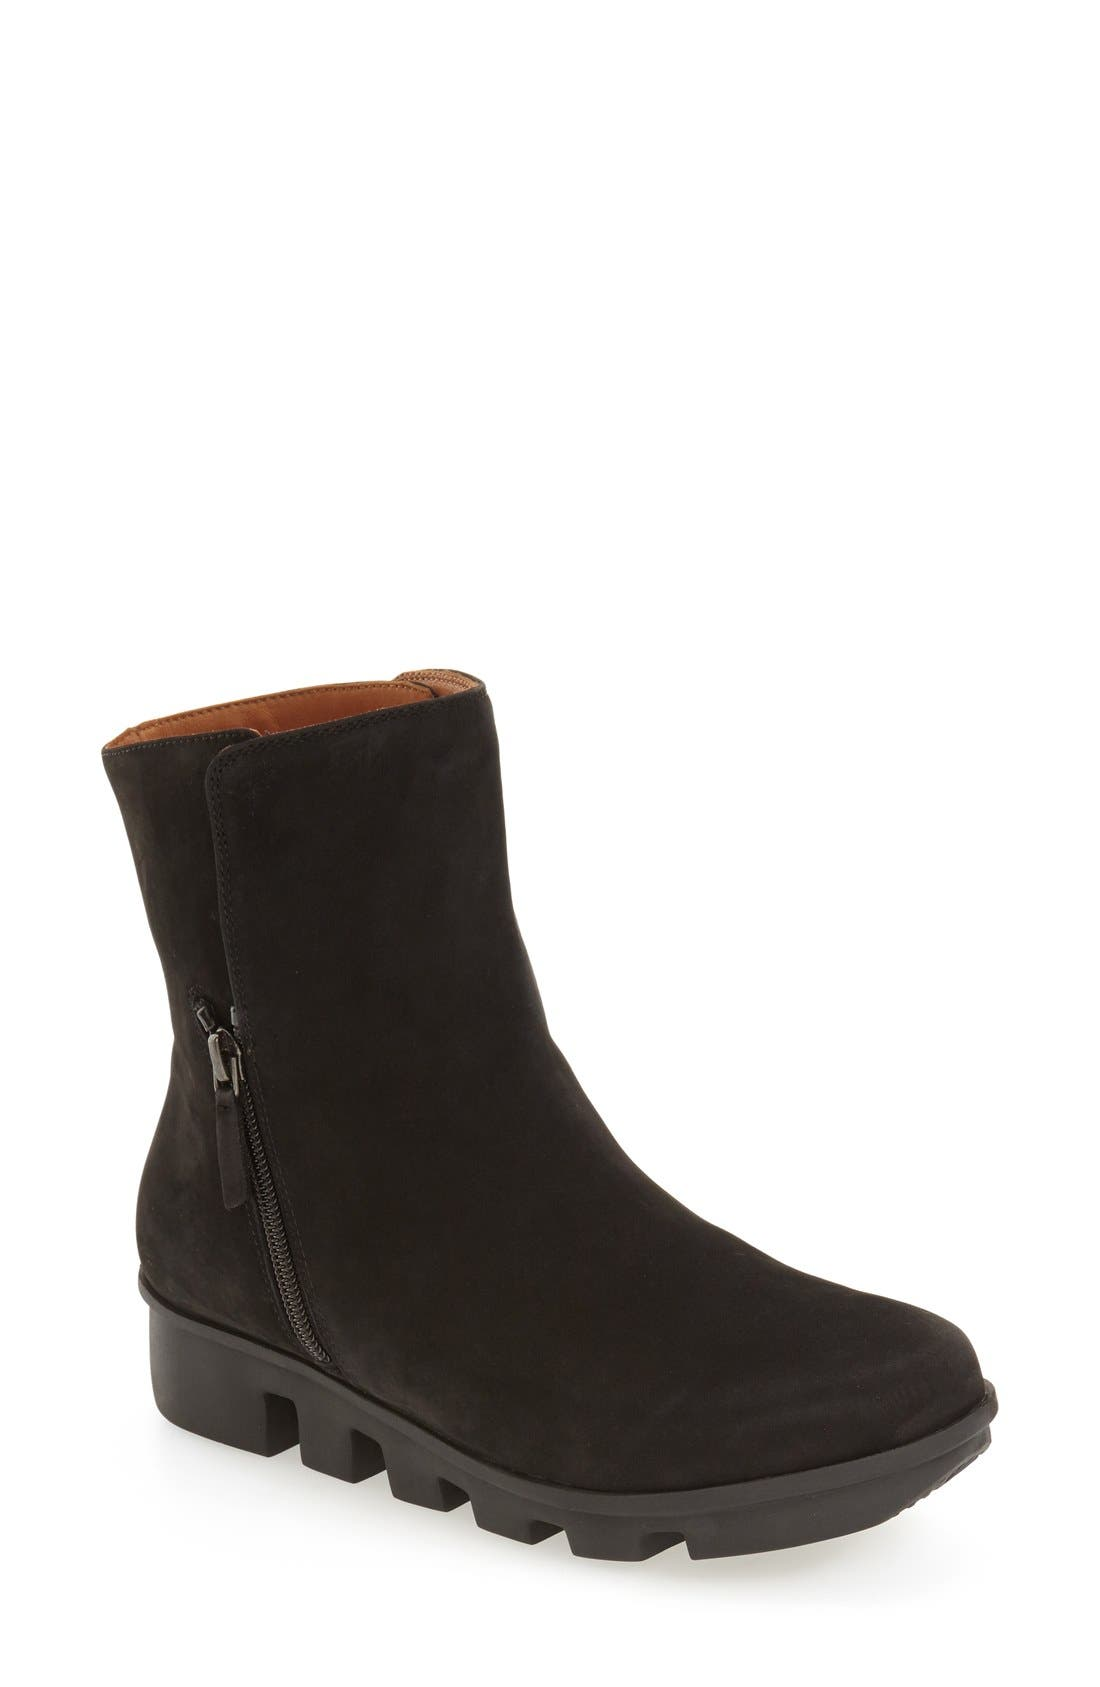 Alternate Image 1 Selected - L'Amour des Pieds 'Harrietta' Boot (Women)